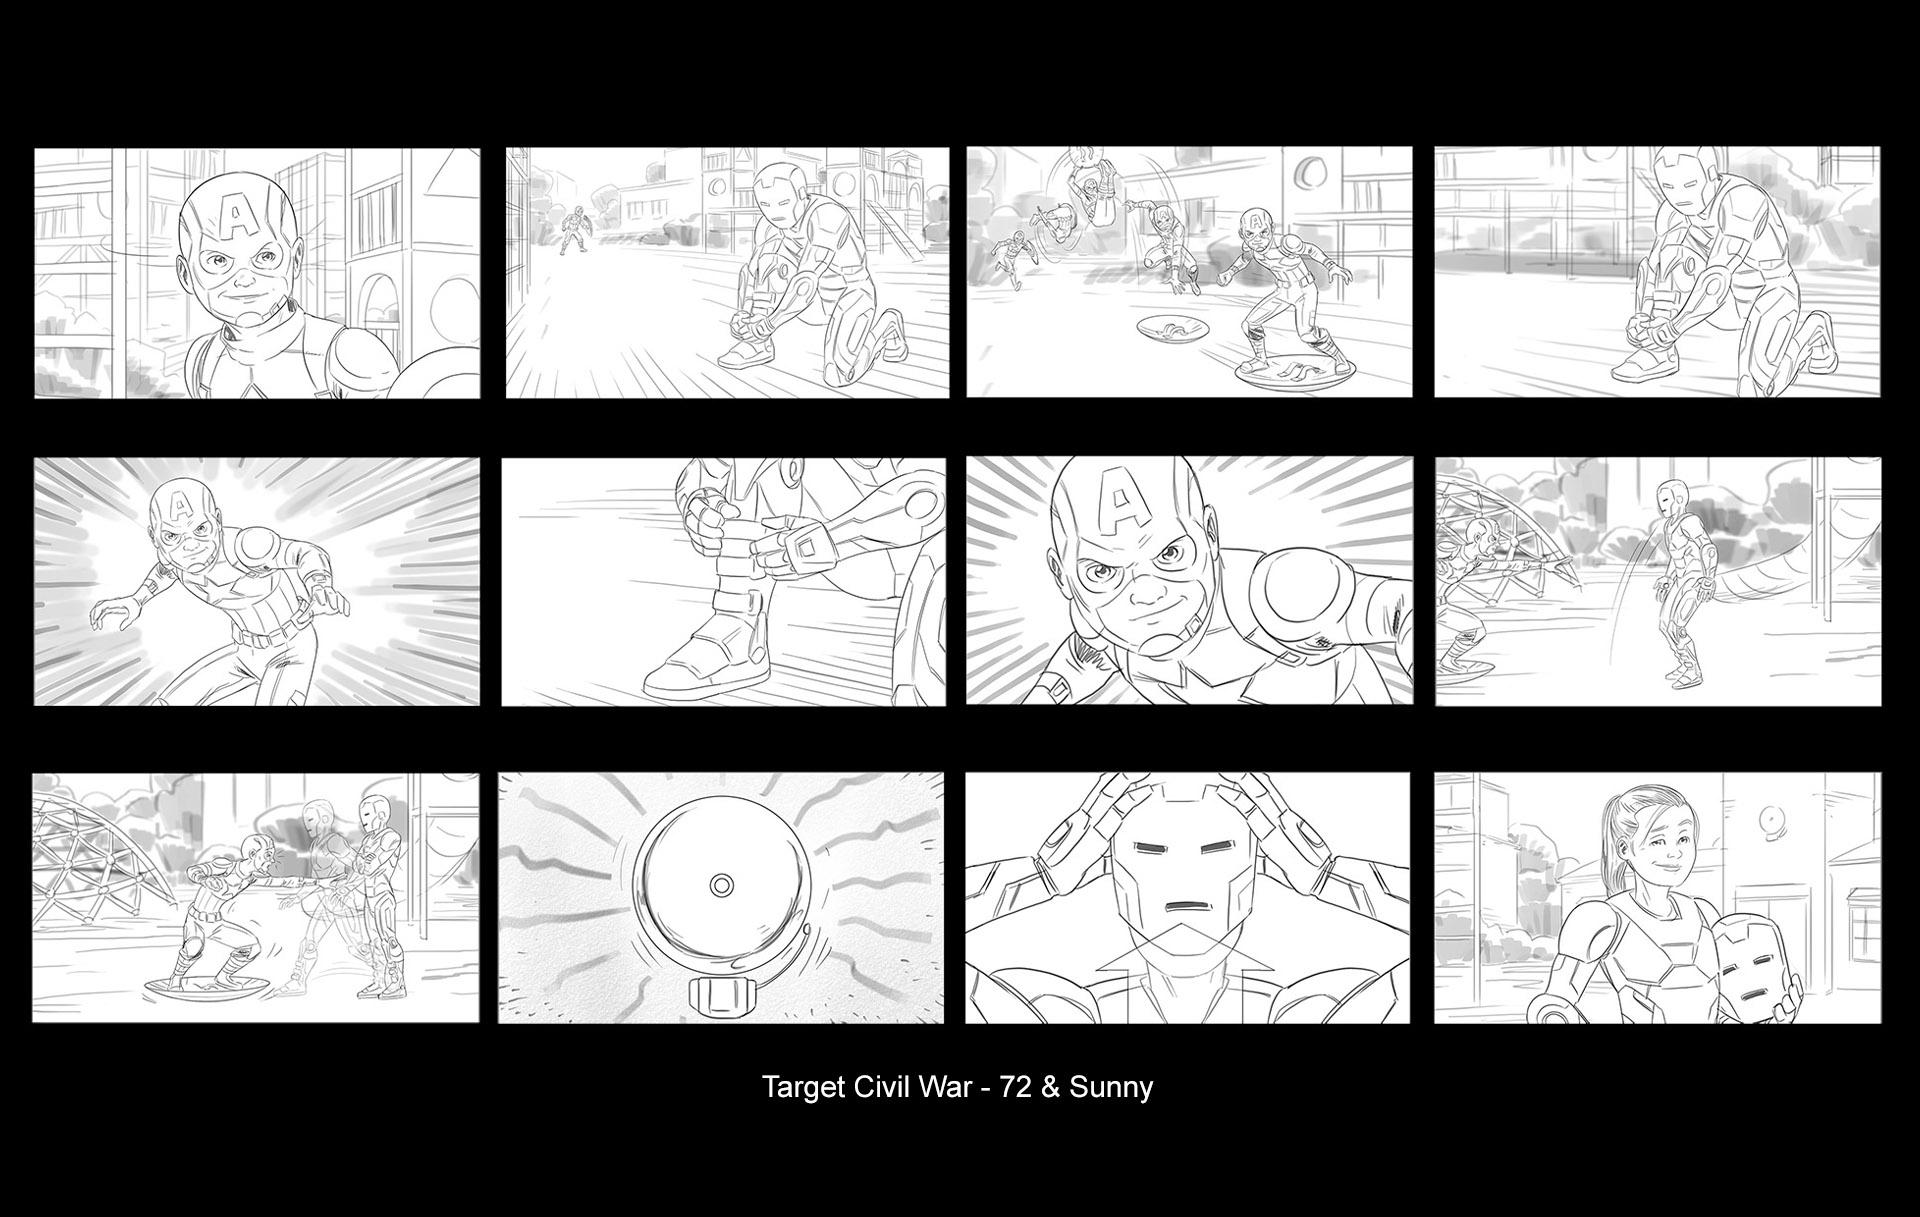 Target Civil War 2.jpg